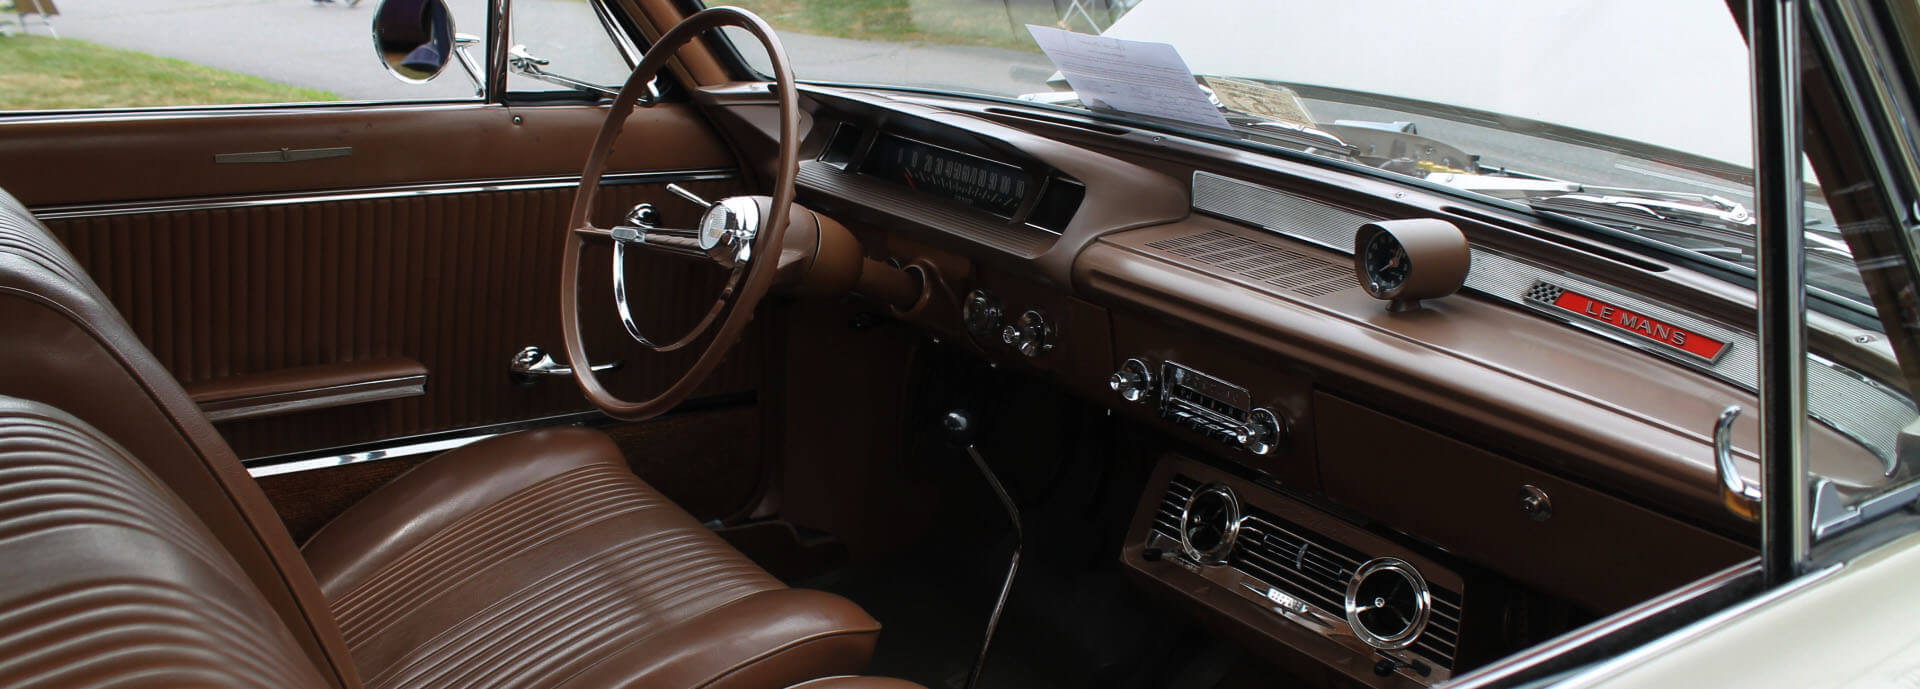 oldsmobile intrigue wood grain dash kits daily. Black Bedroom Furniture Sets. Home Design Ideas